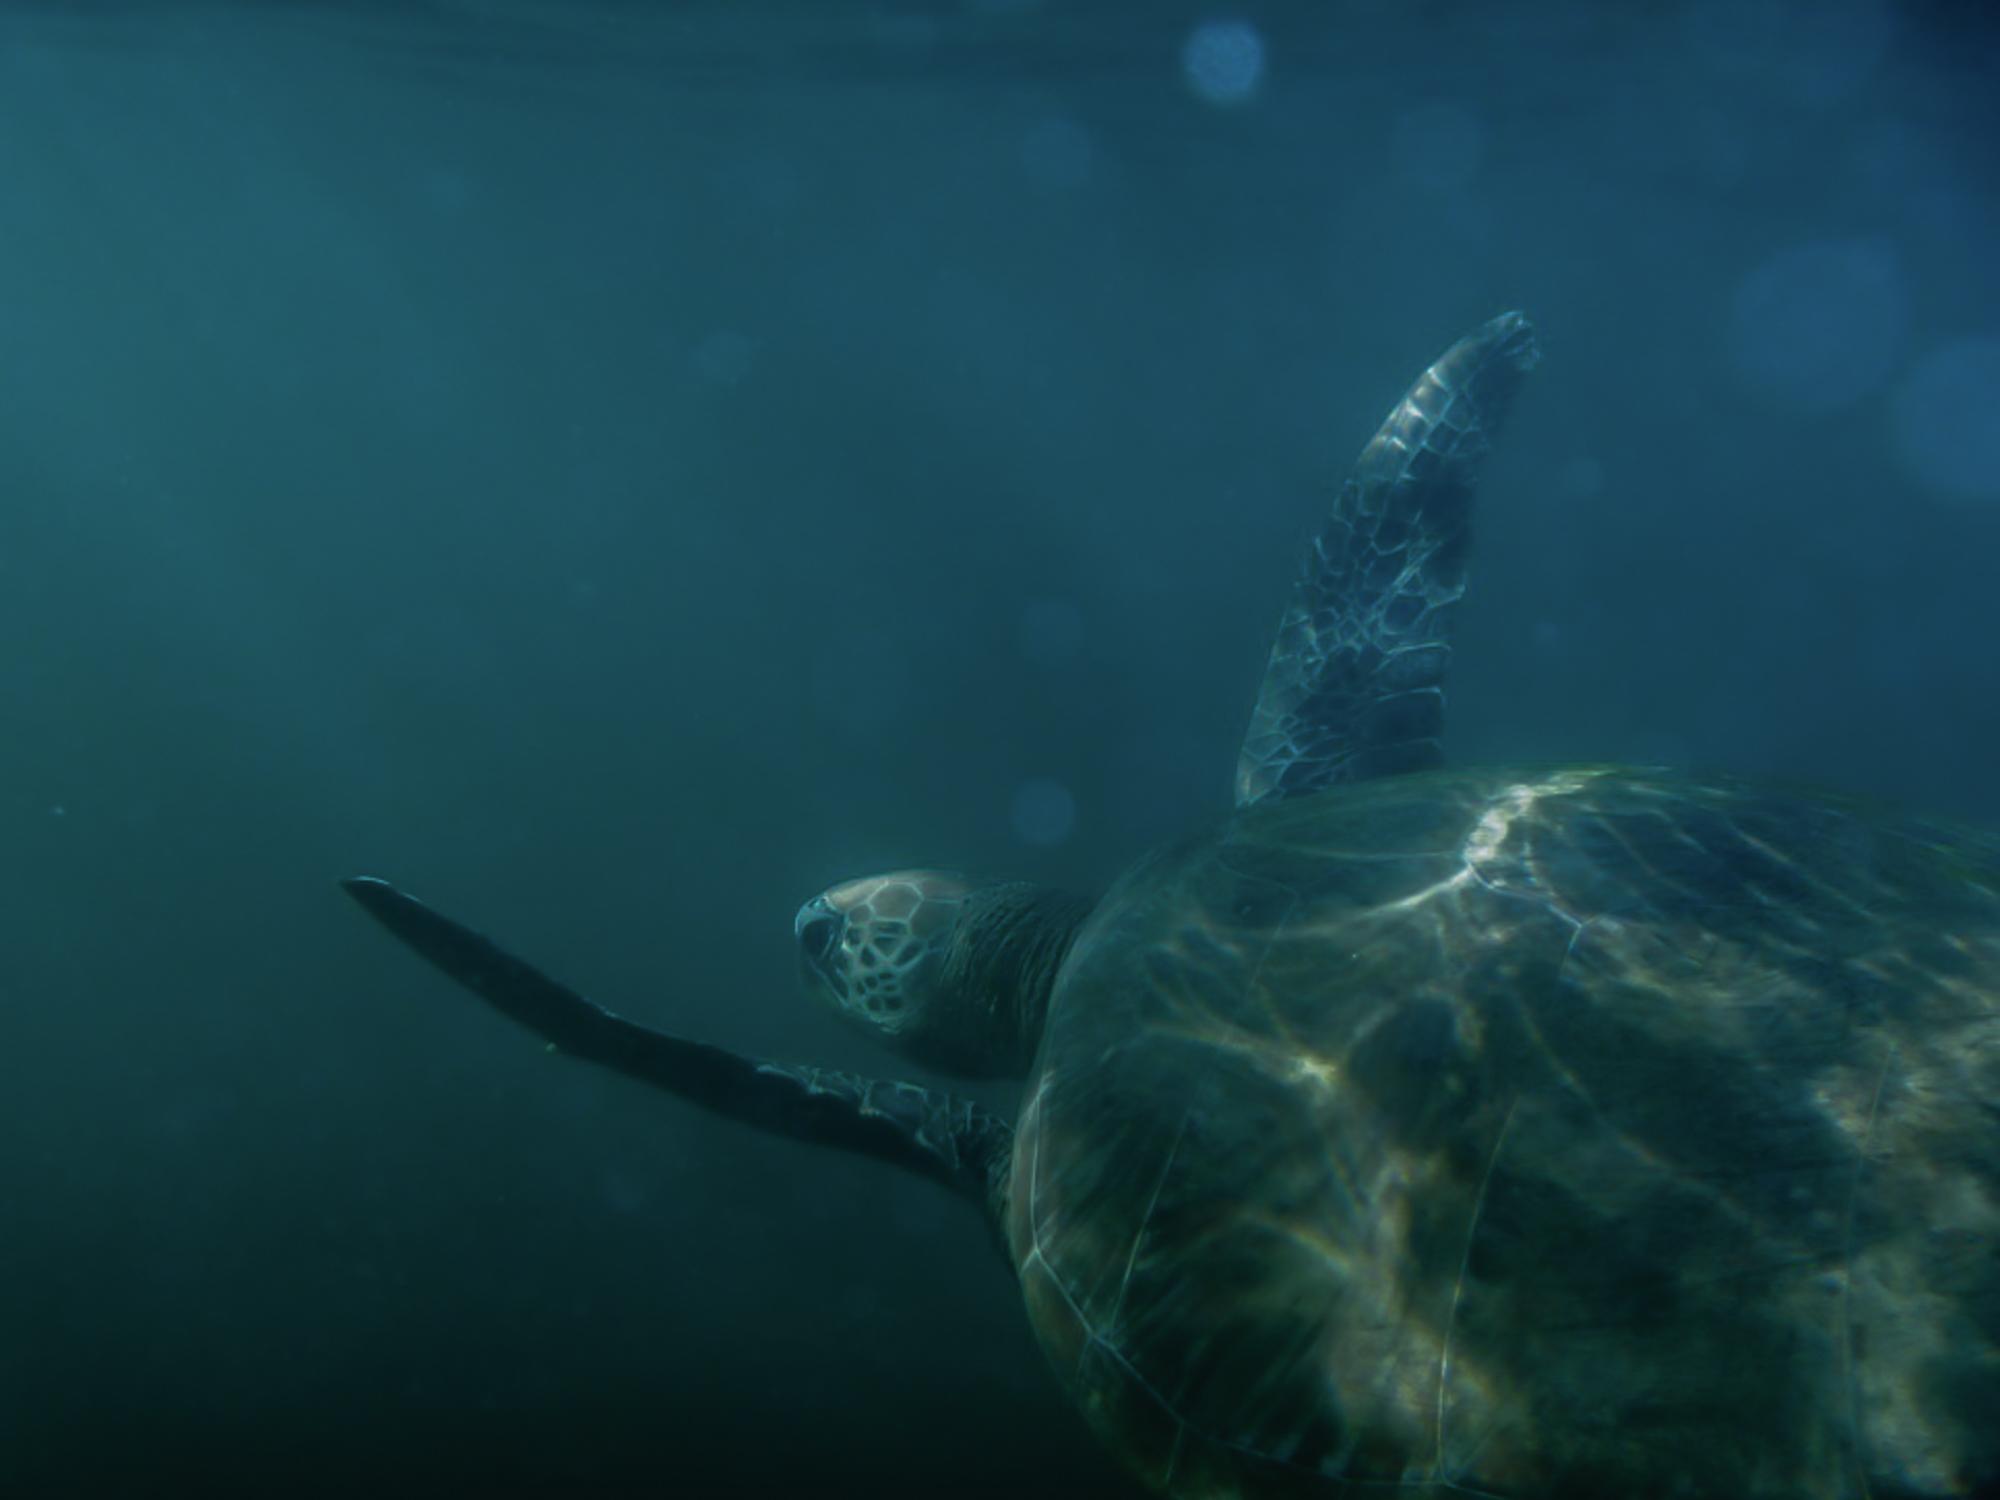 First photograph of a turtle /Hamilton Island 2012